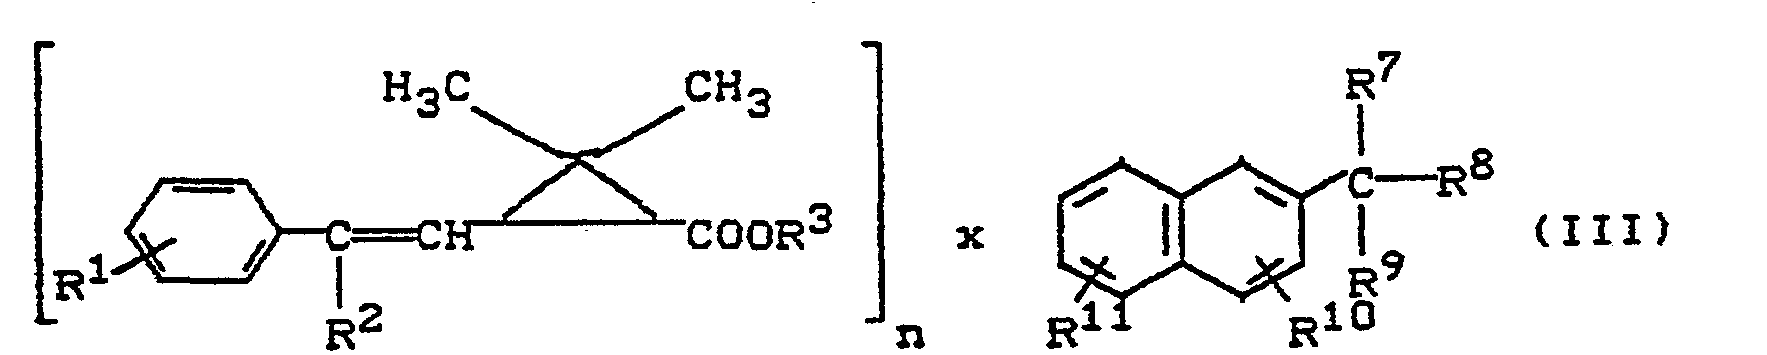 专利ep0261388b1 - process